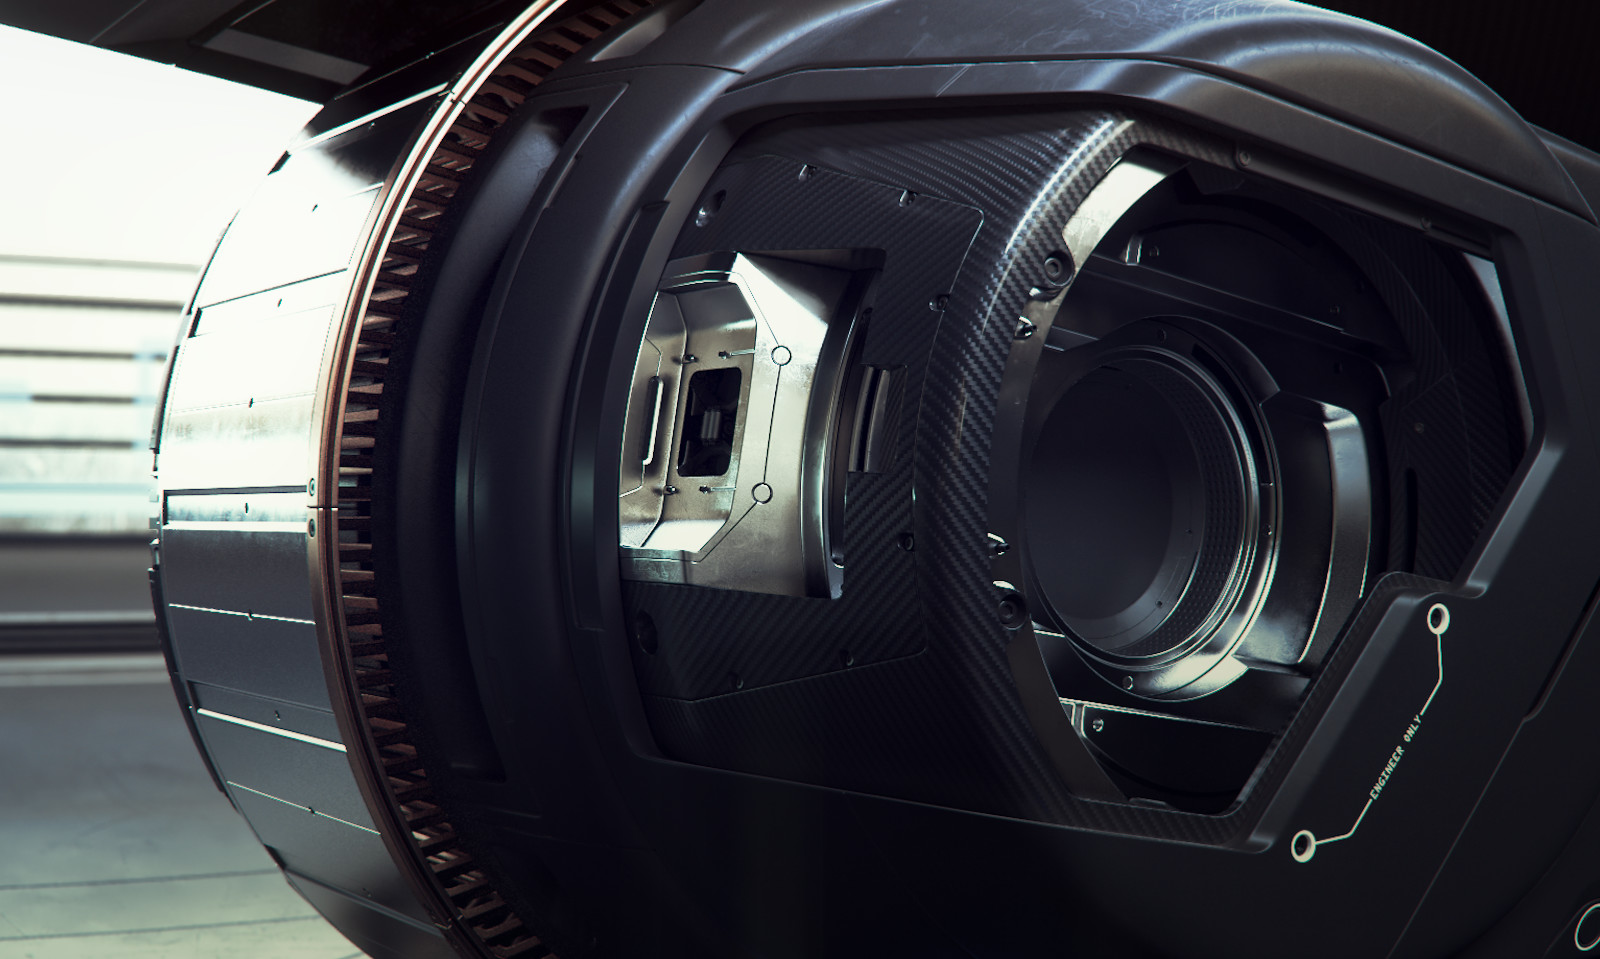 Rear drive internals